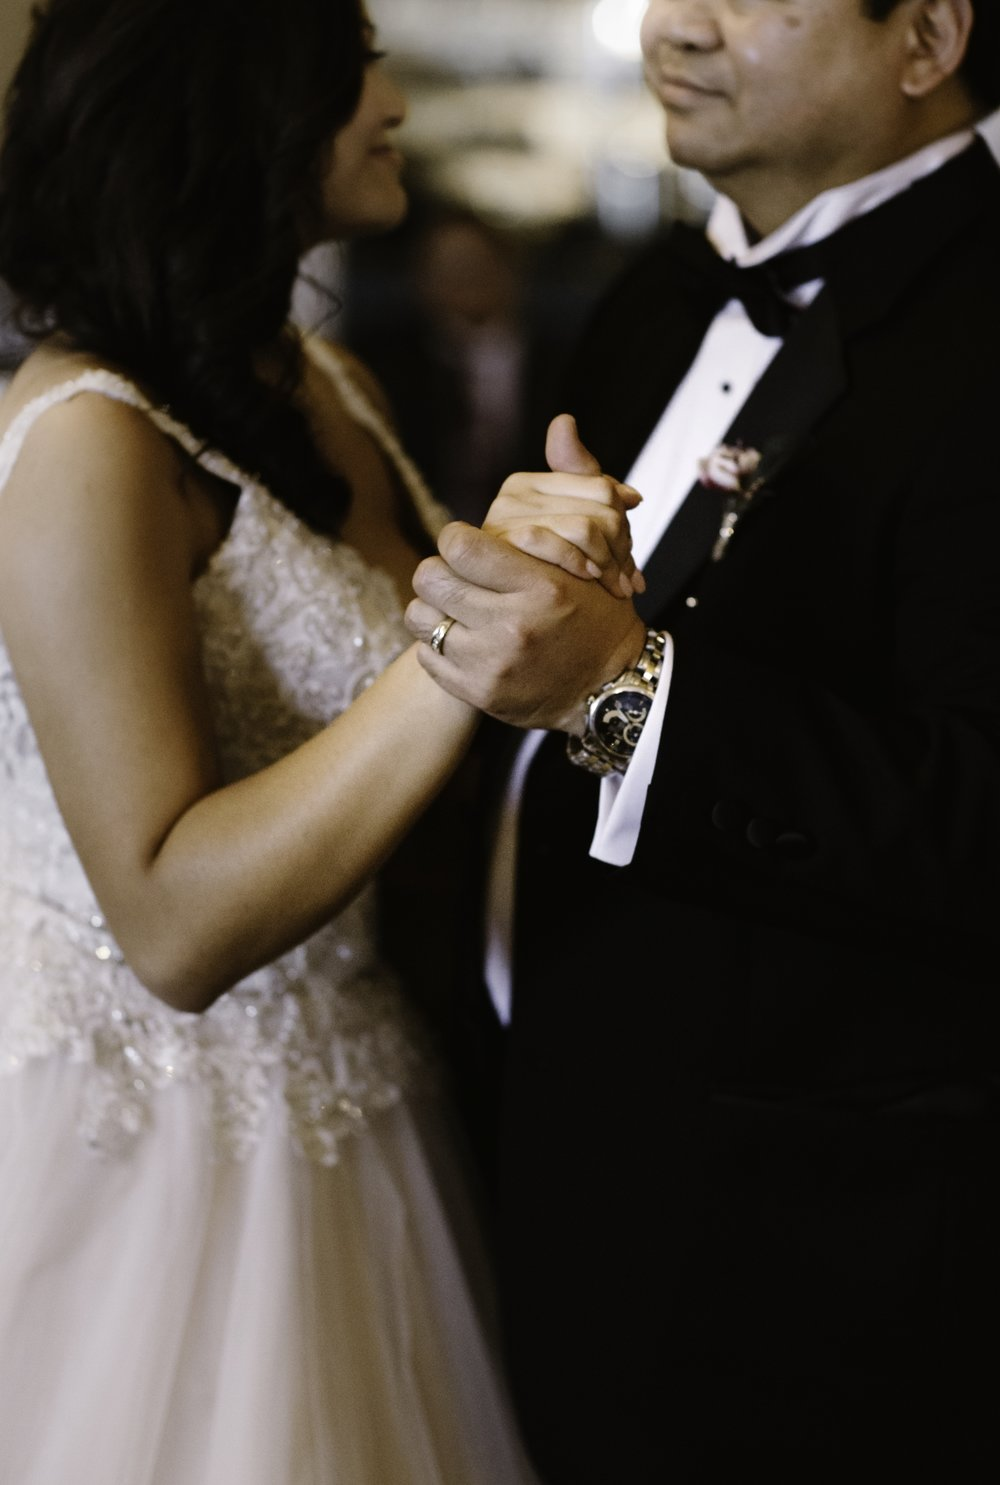 Wedding | St Augustine | Bay View at A1A aleworks| Roxanne and LJ | Vanessa Boy | Orlando Florida | Vanessa Boy | vanessaboy.com-144final.jpg